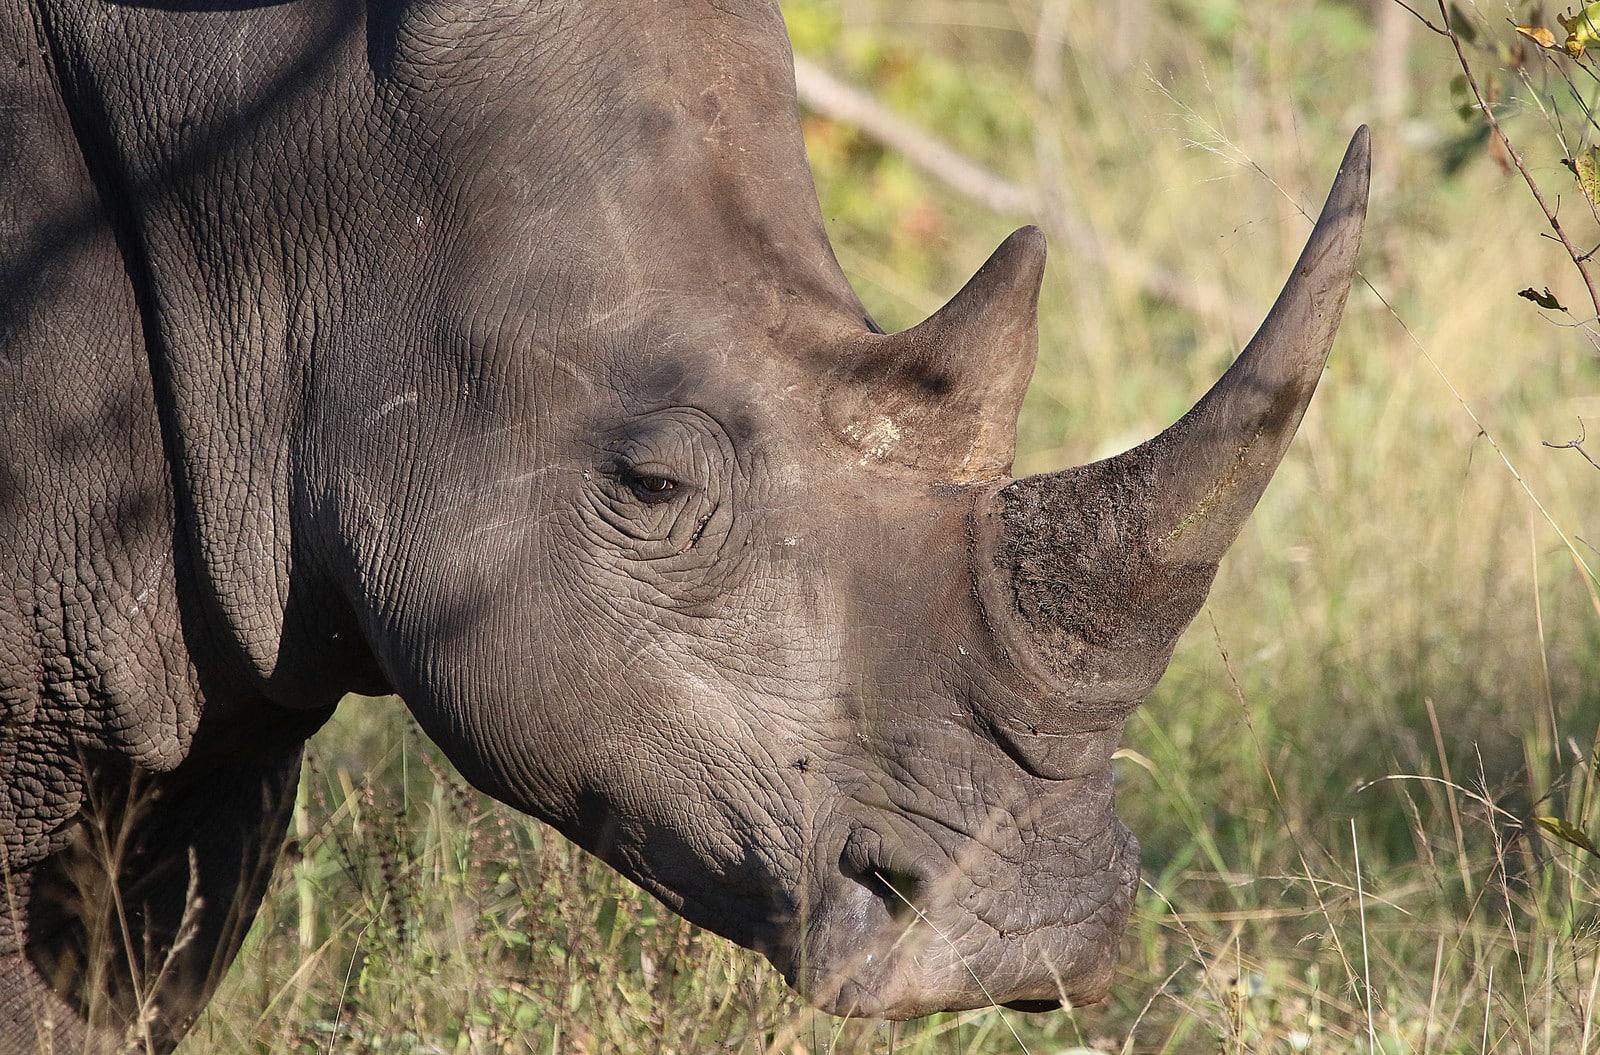 A black rhino in the grass